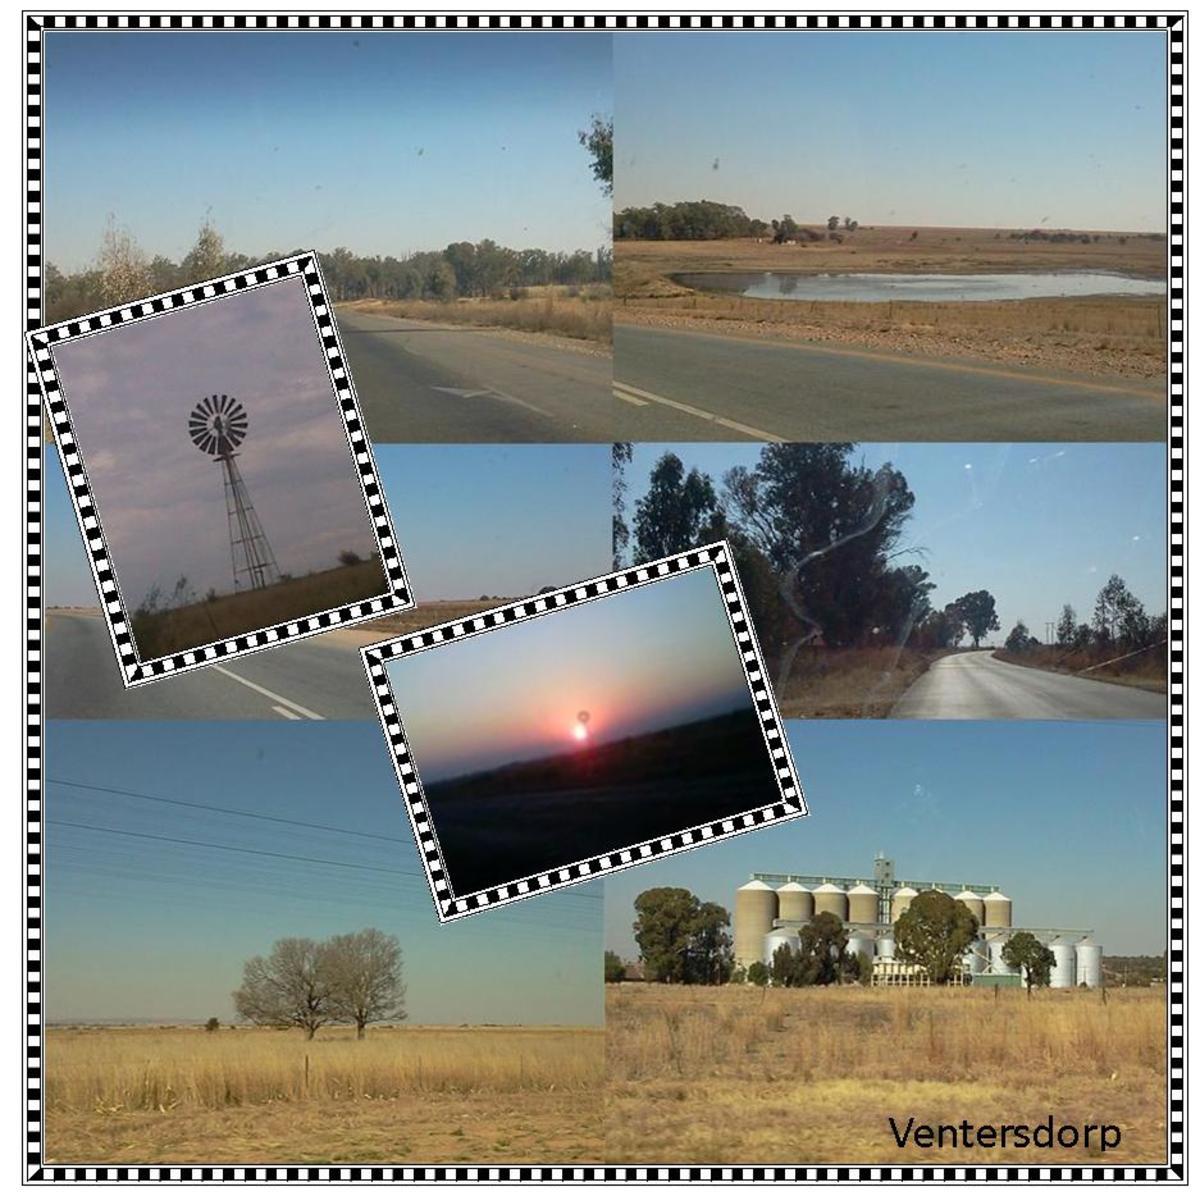 Region Venterdorp, North West Povince, South Africa